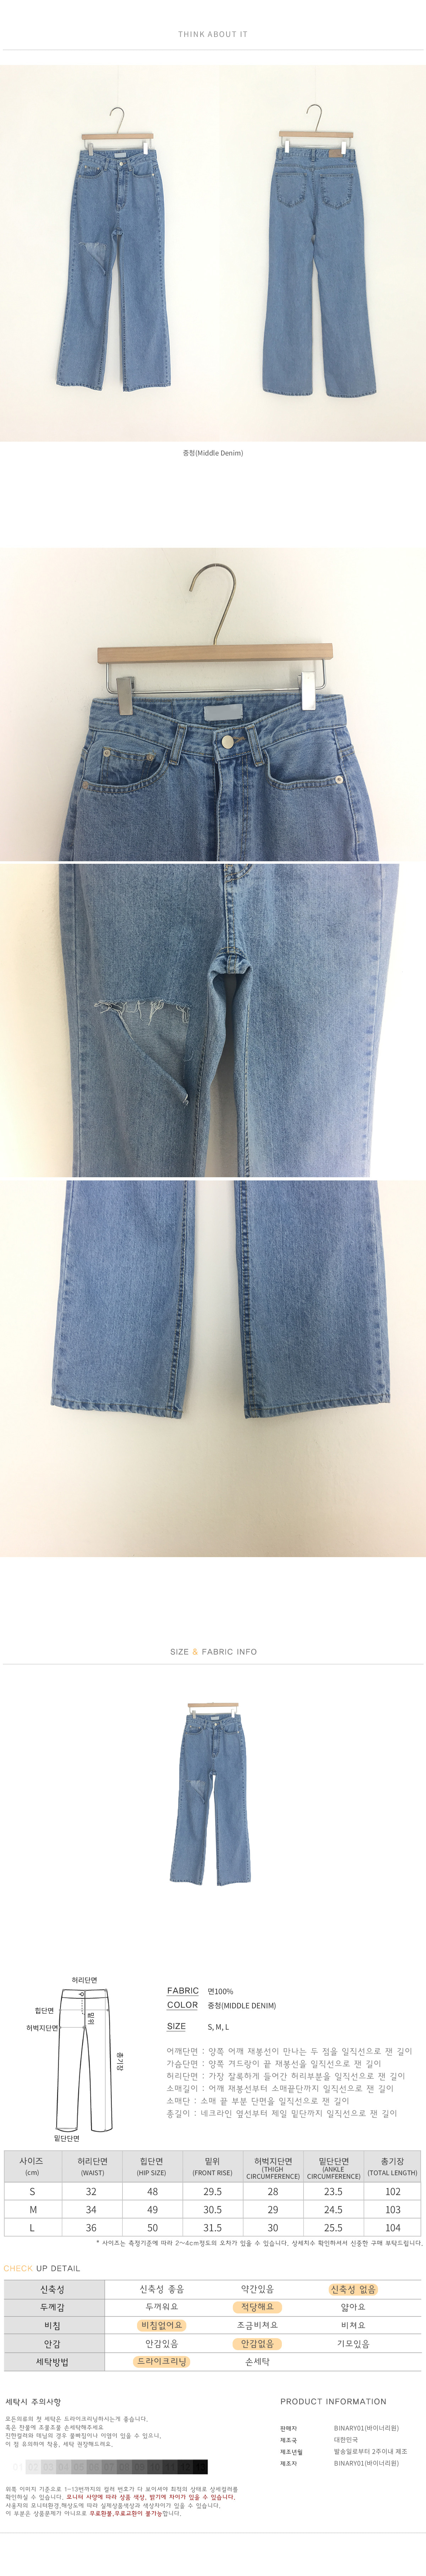 Cutting deli denim pants